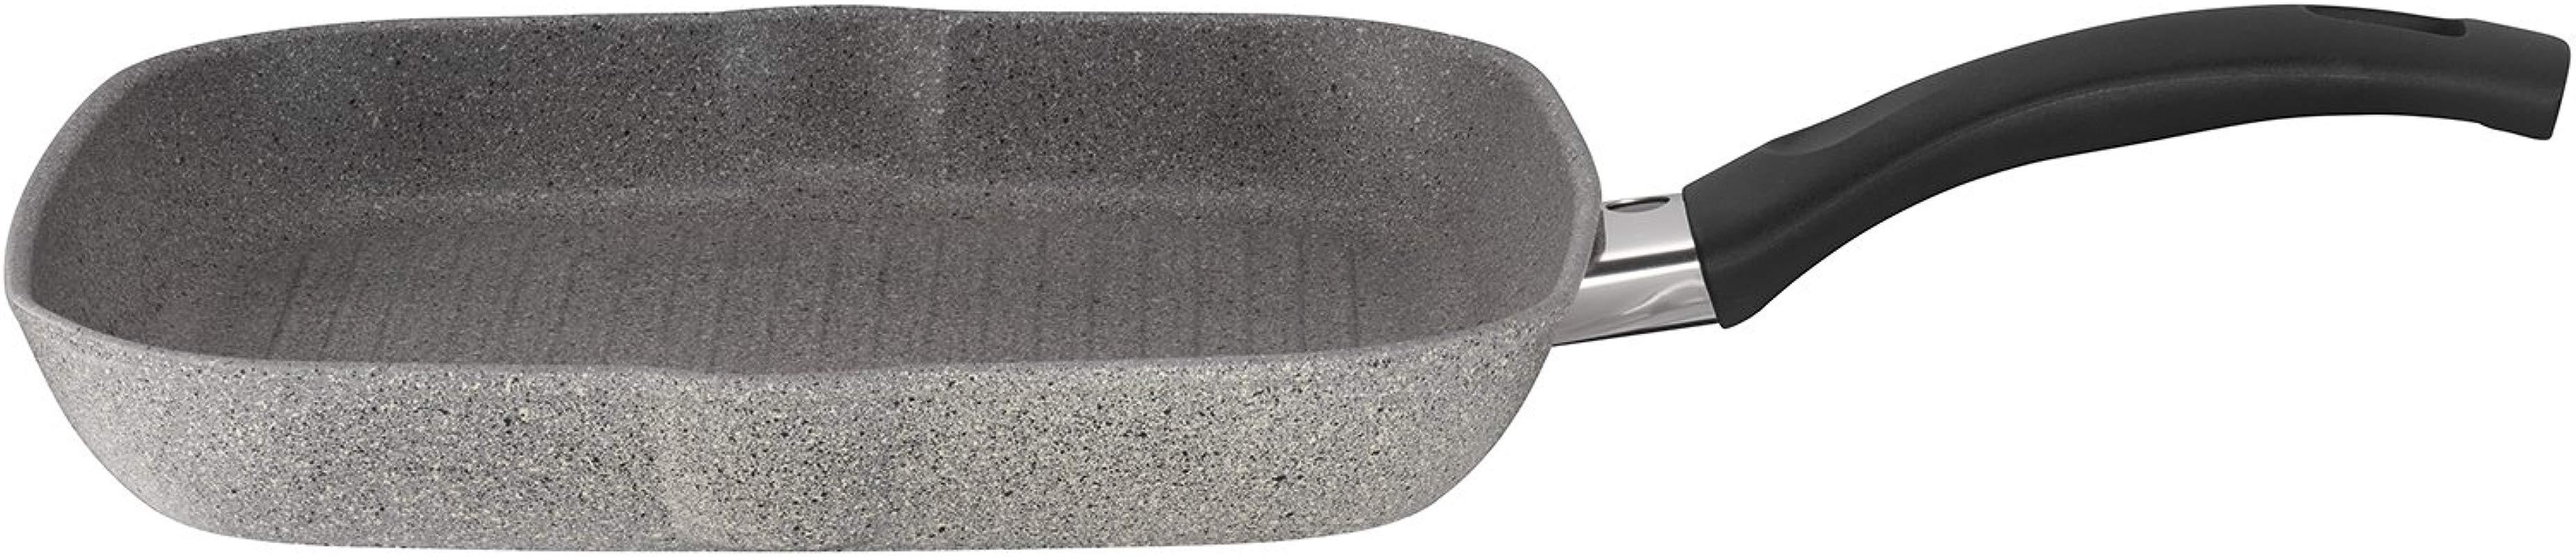 Ballarini 75001 646 Parma Forged Aluminum Nonstick Grill Pan 11 Inch Granite